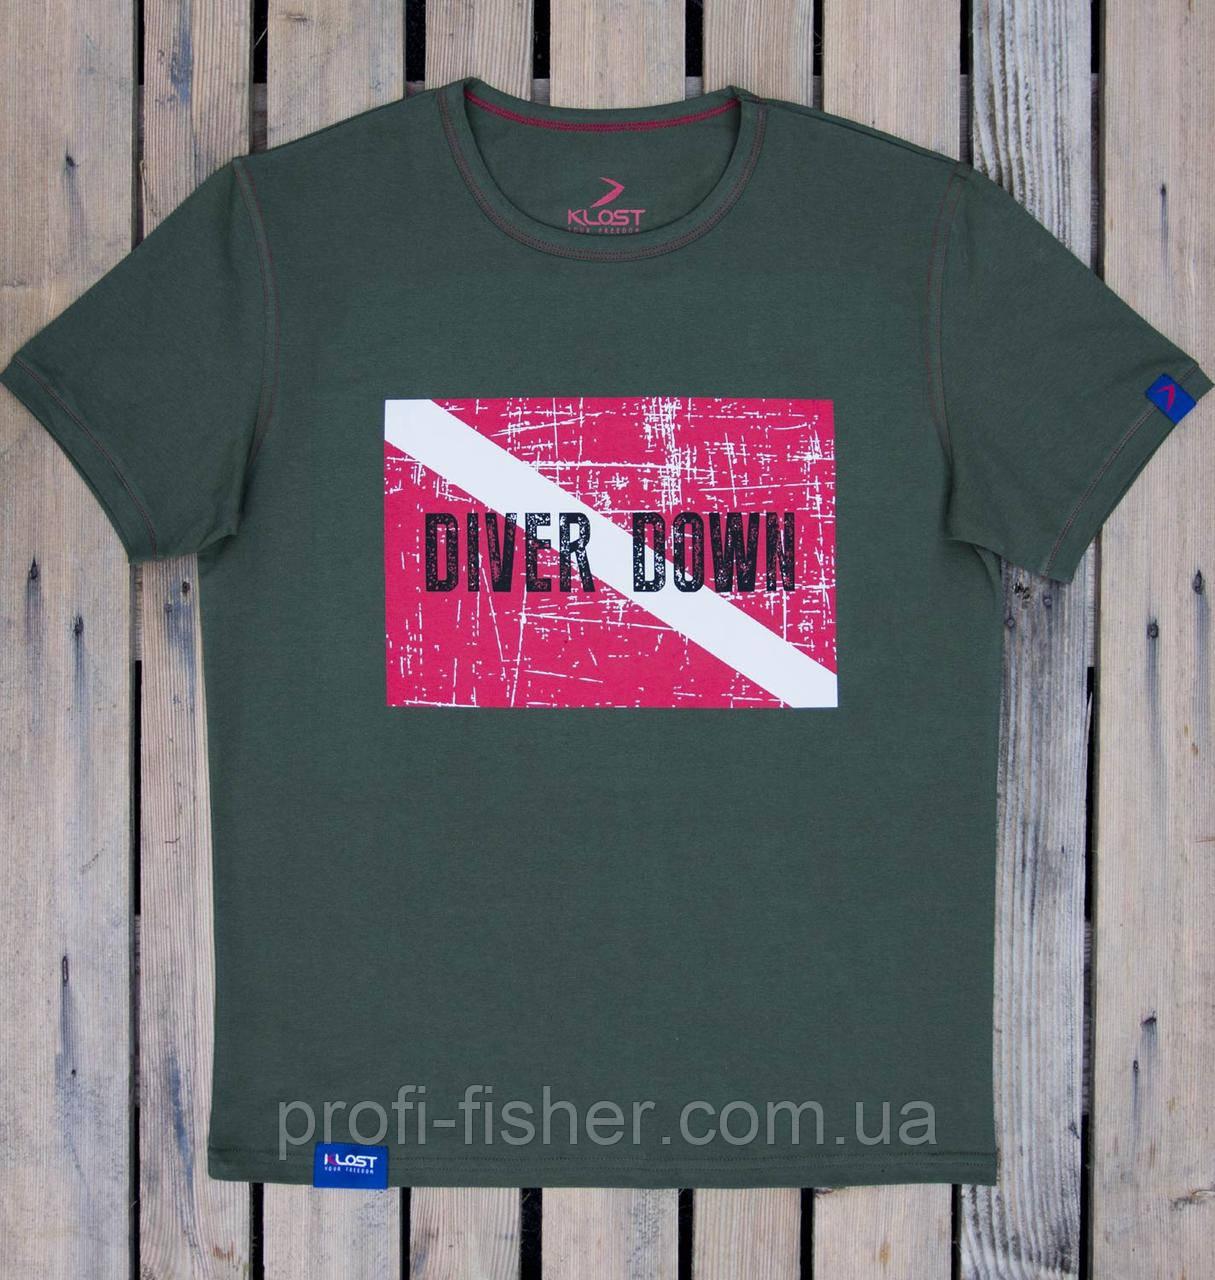 Футболка KLOST Diver Down 70.02 4XL Green